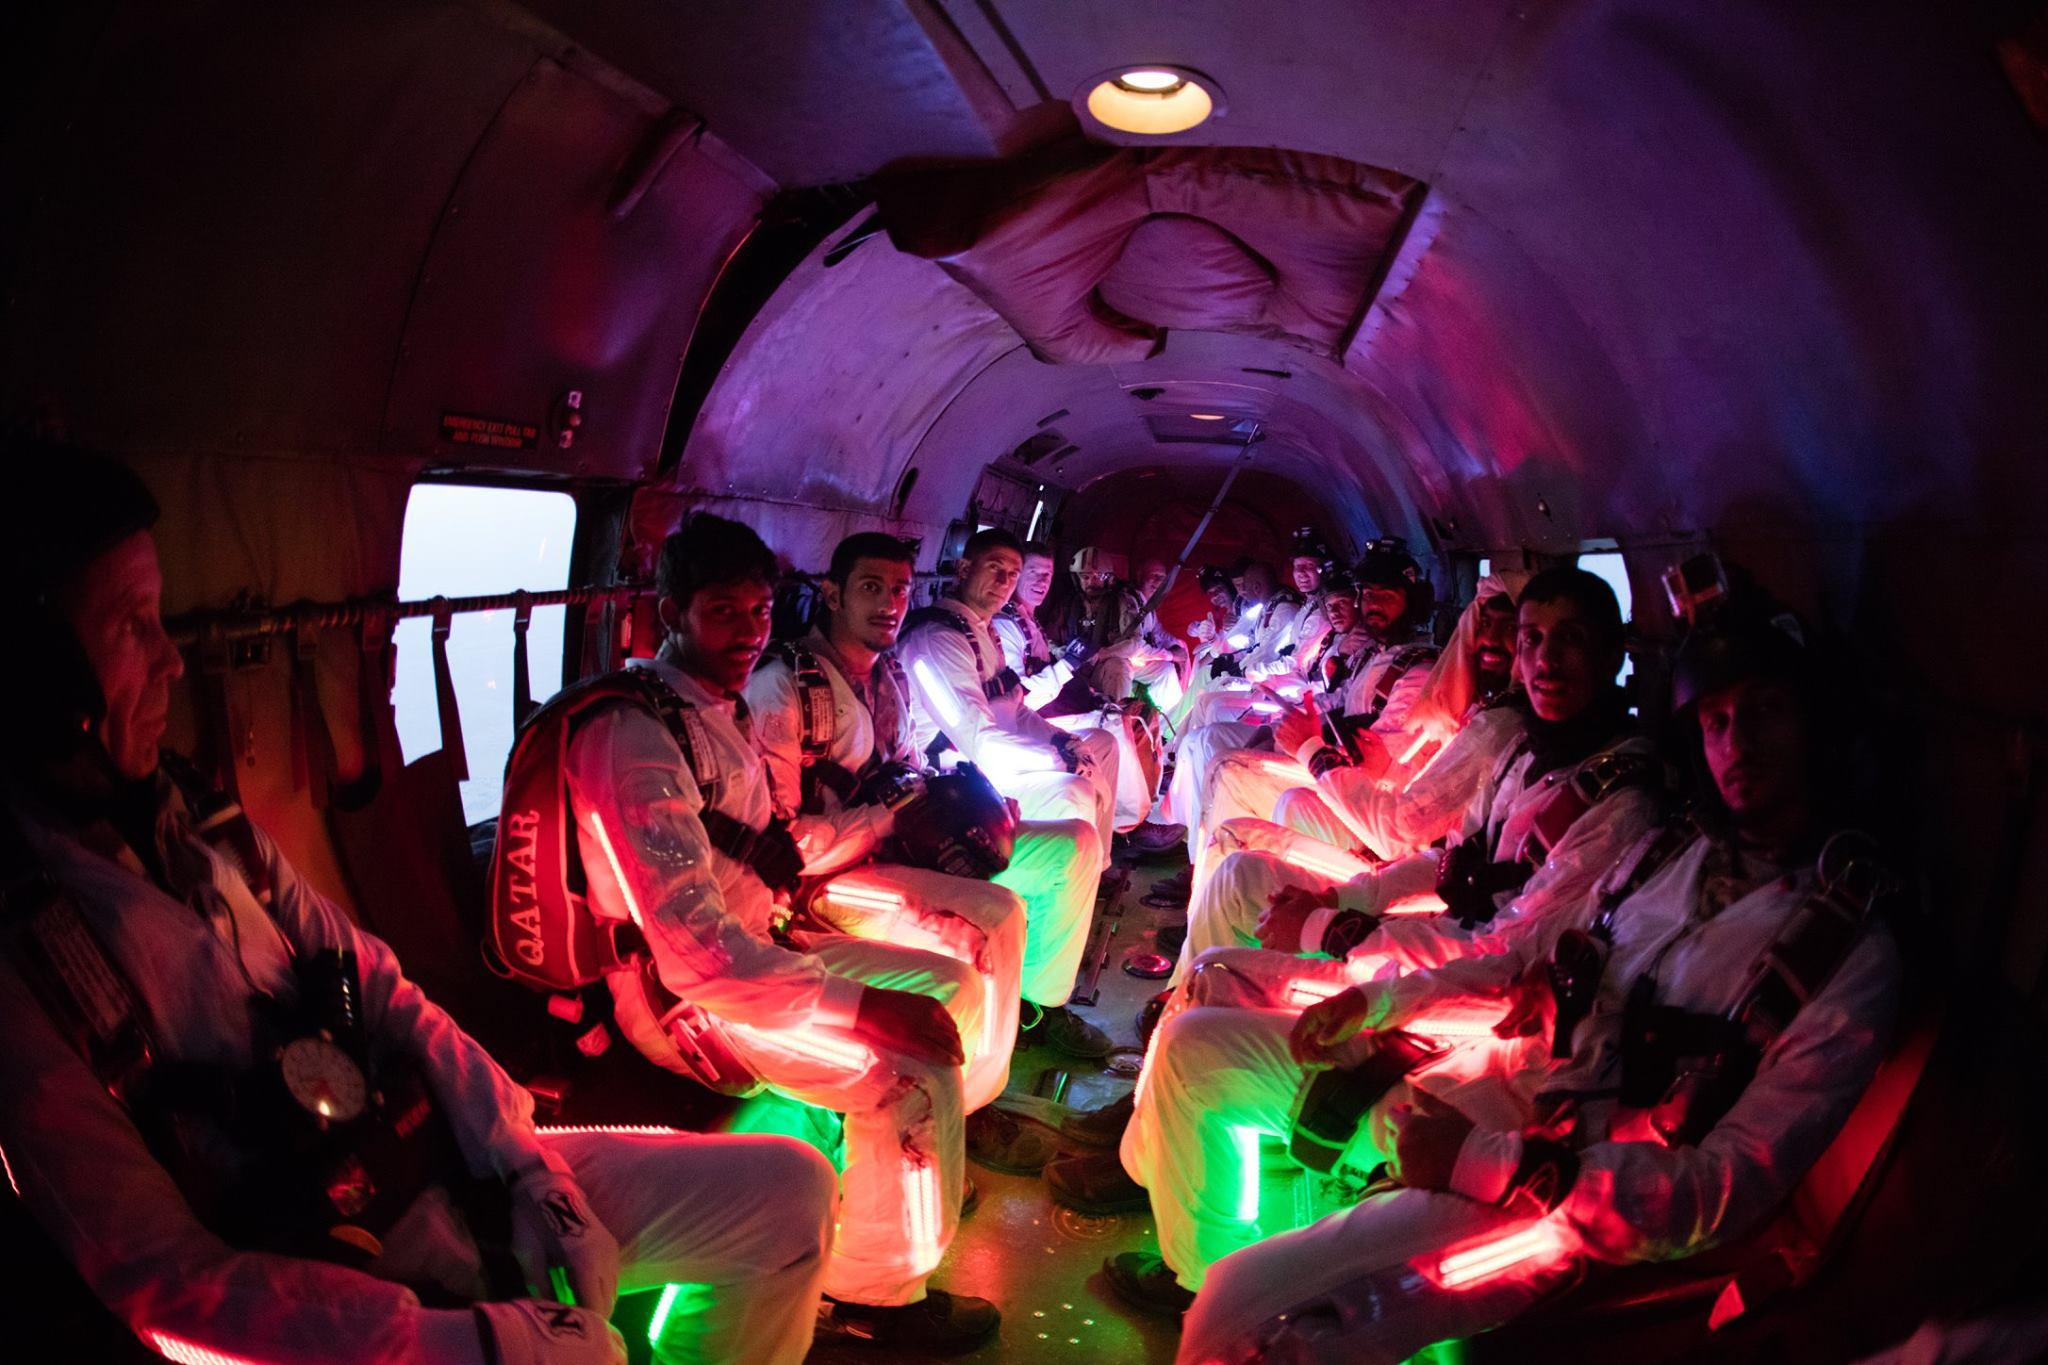 custom lighting parachute formation LEDs